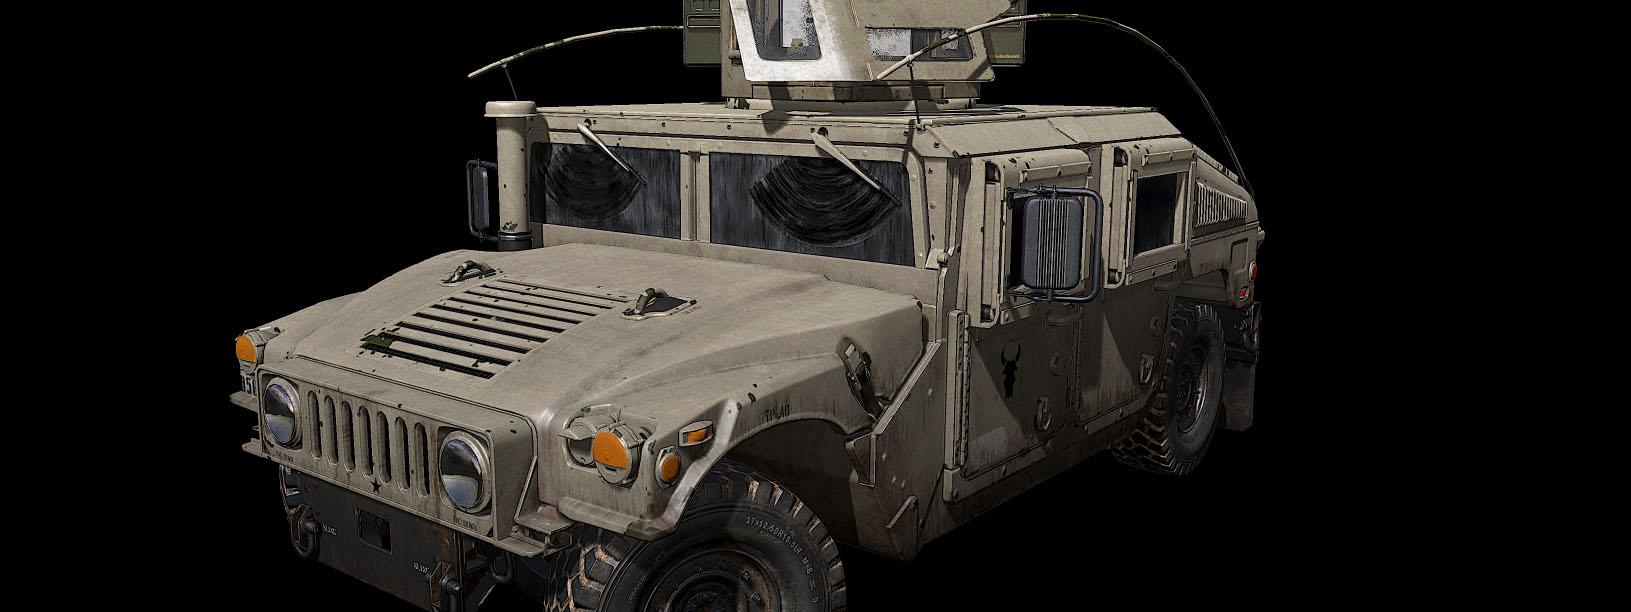 3D модель американского армейского вездехода M1151 HMMWV